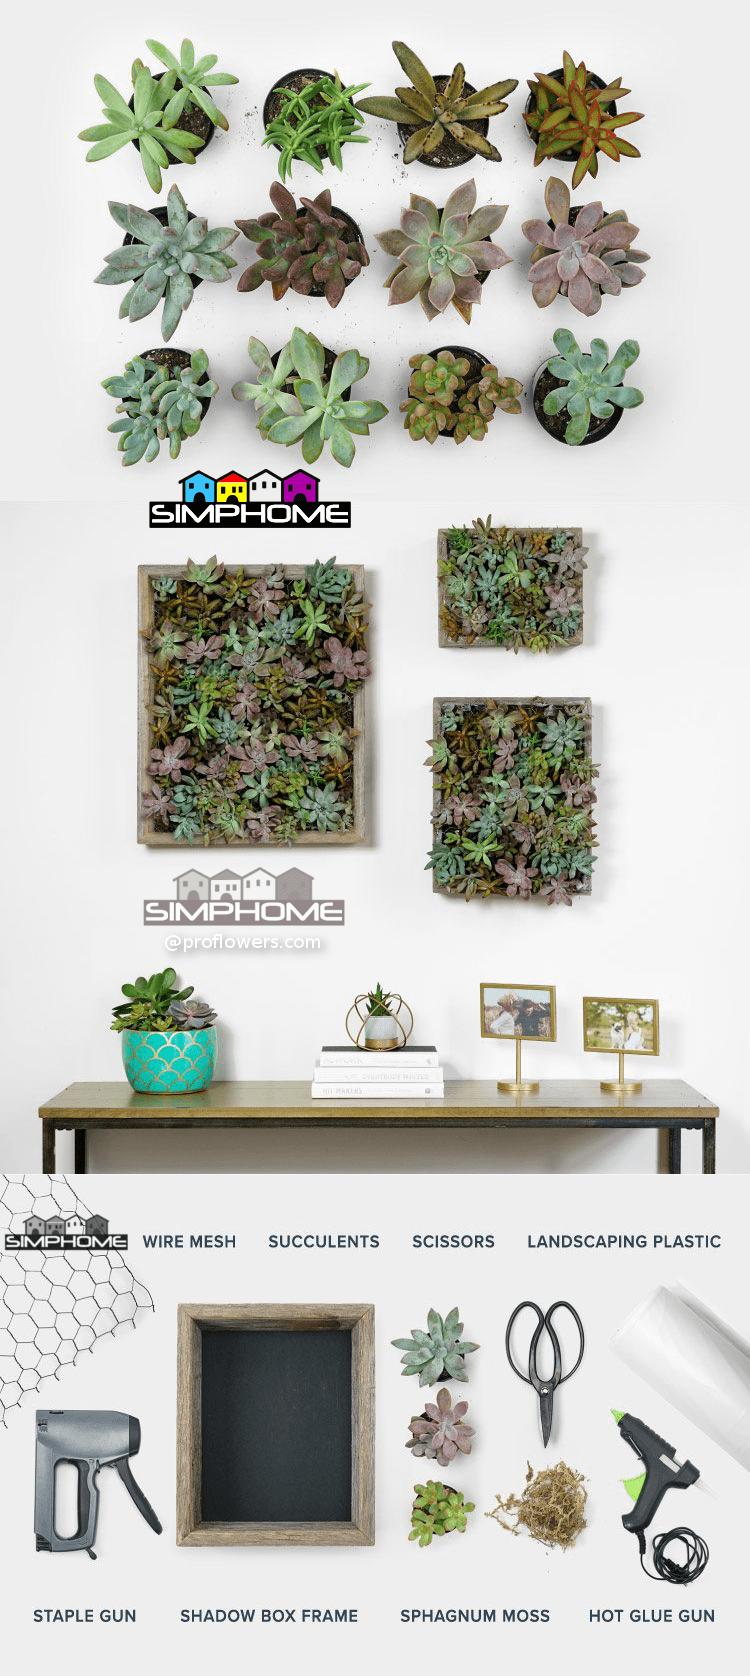 5.Succulent Wall Garden via Simphome.com